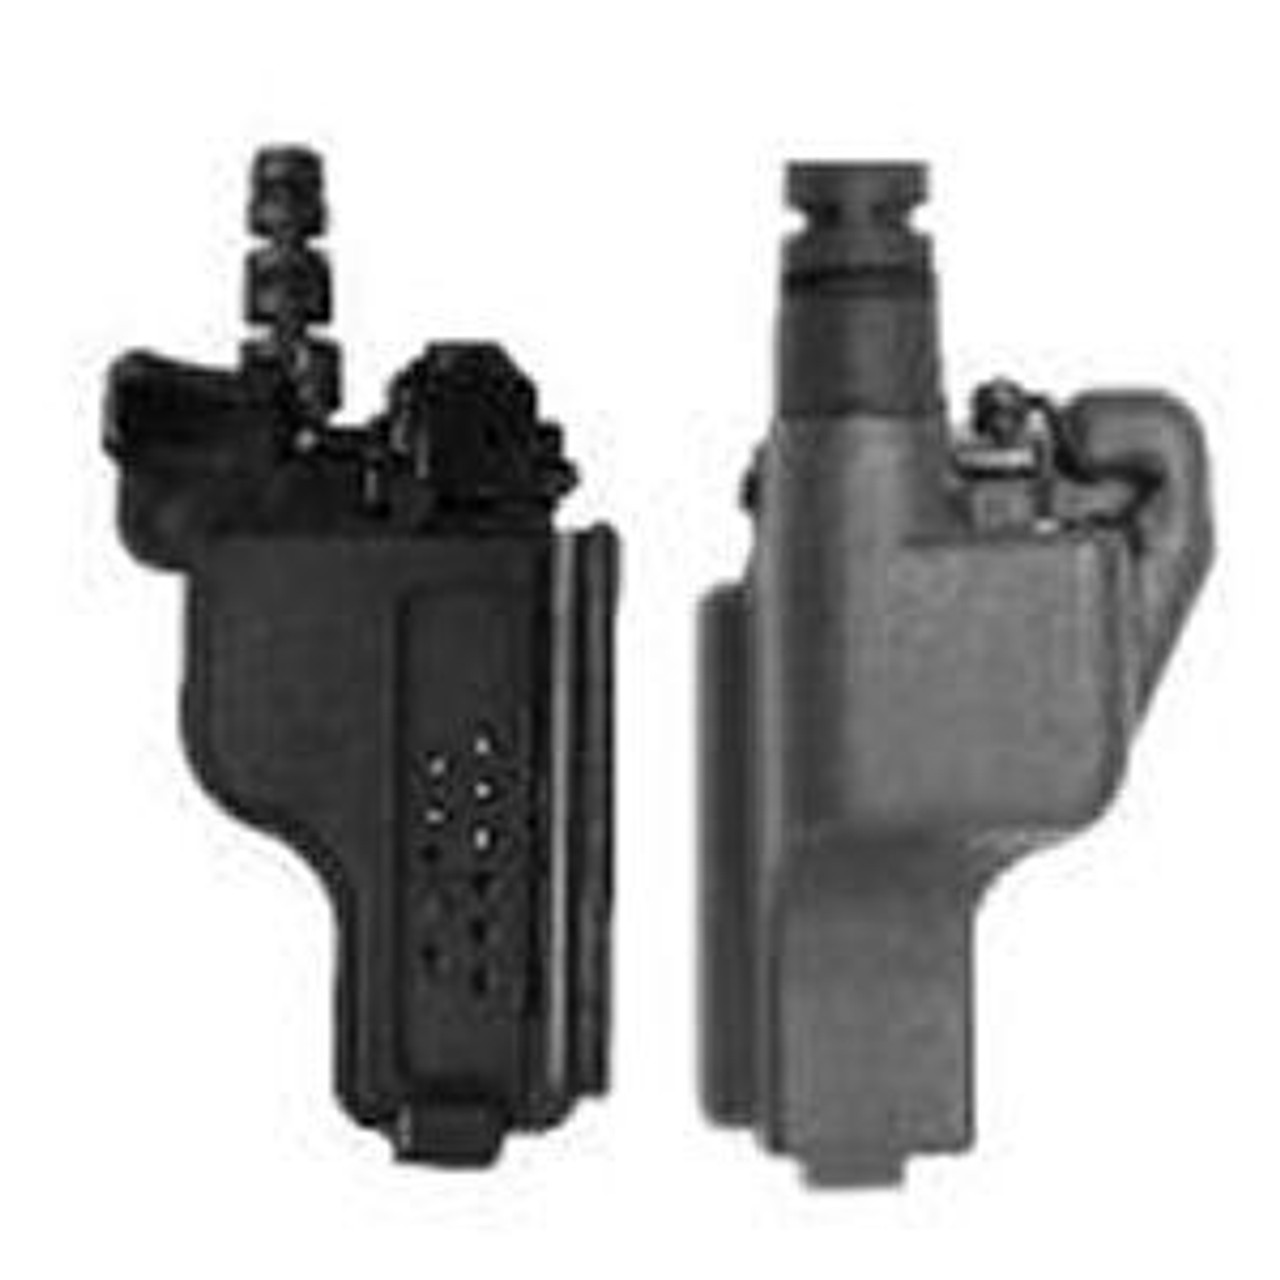 EF Johnson VP300 Tactical Noise Canceling Single Muff Headset